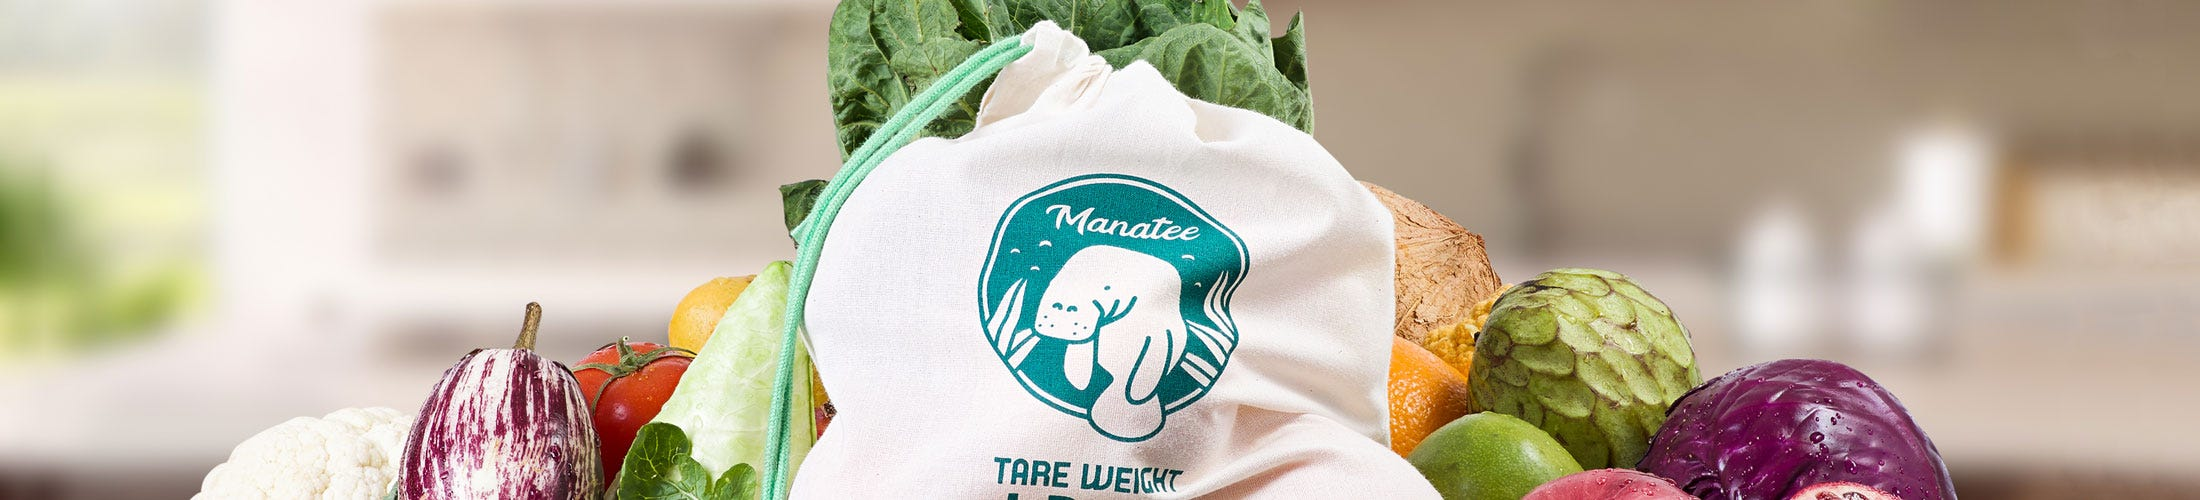 Manatee Bags